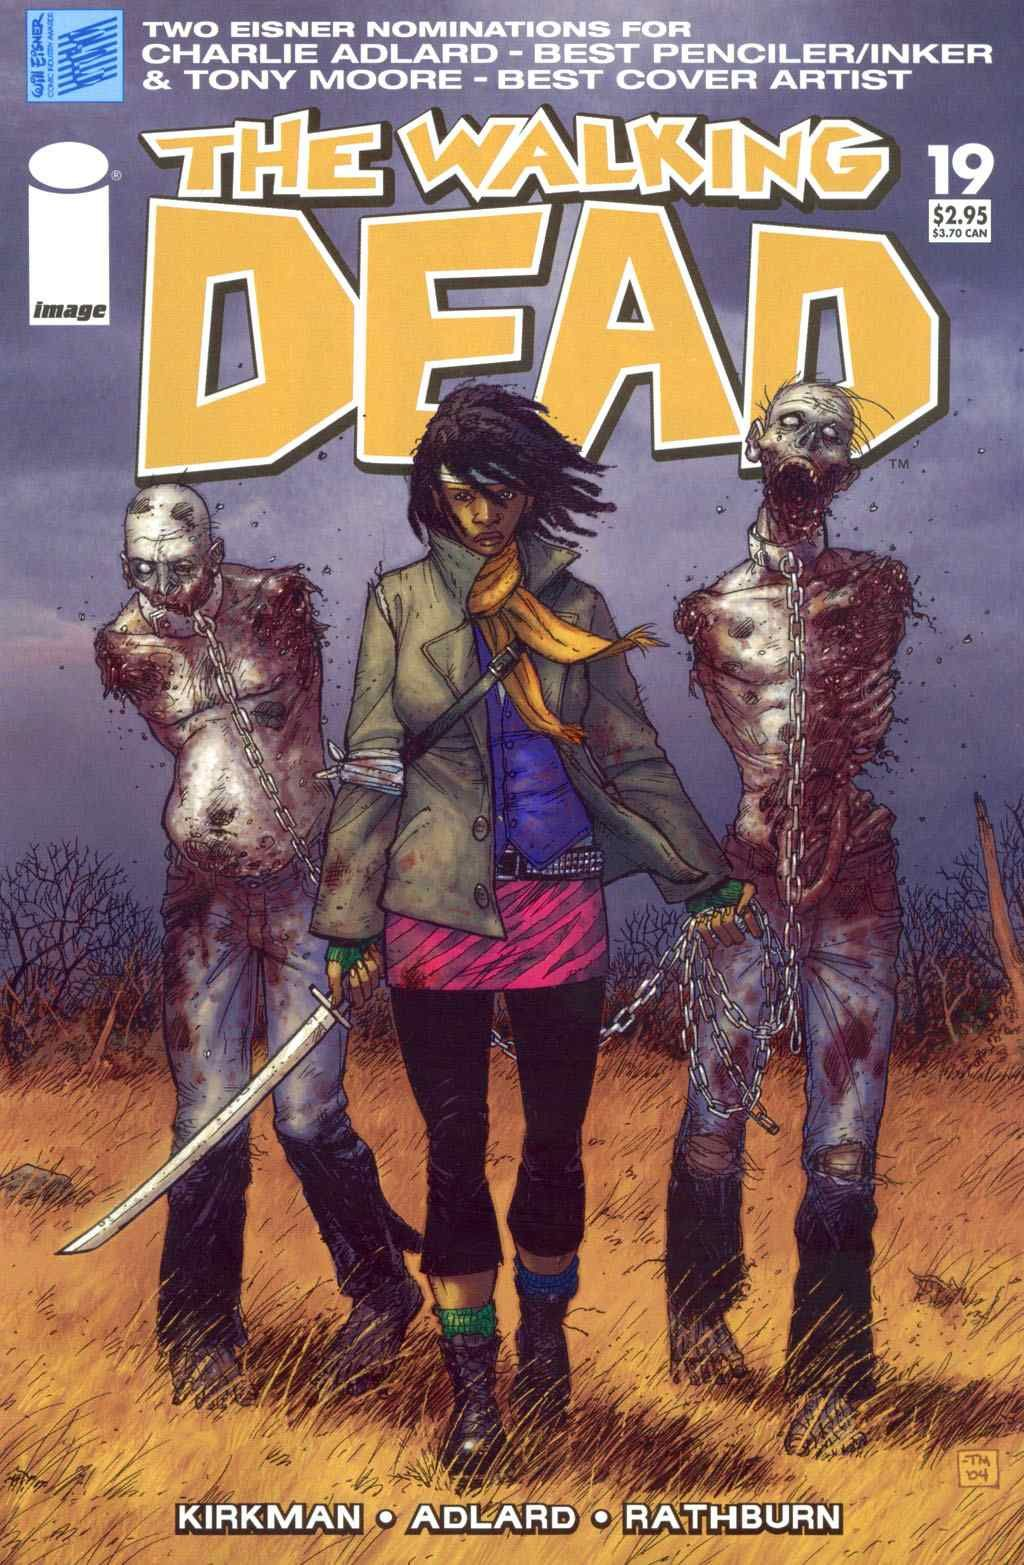 Read Comics Online Free - The Walking Dead - Chapter 019